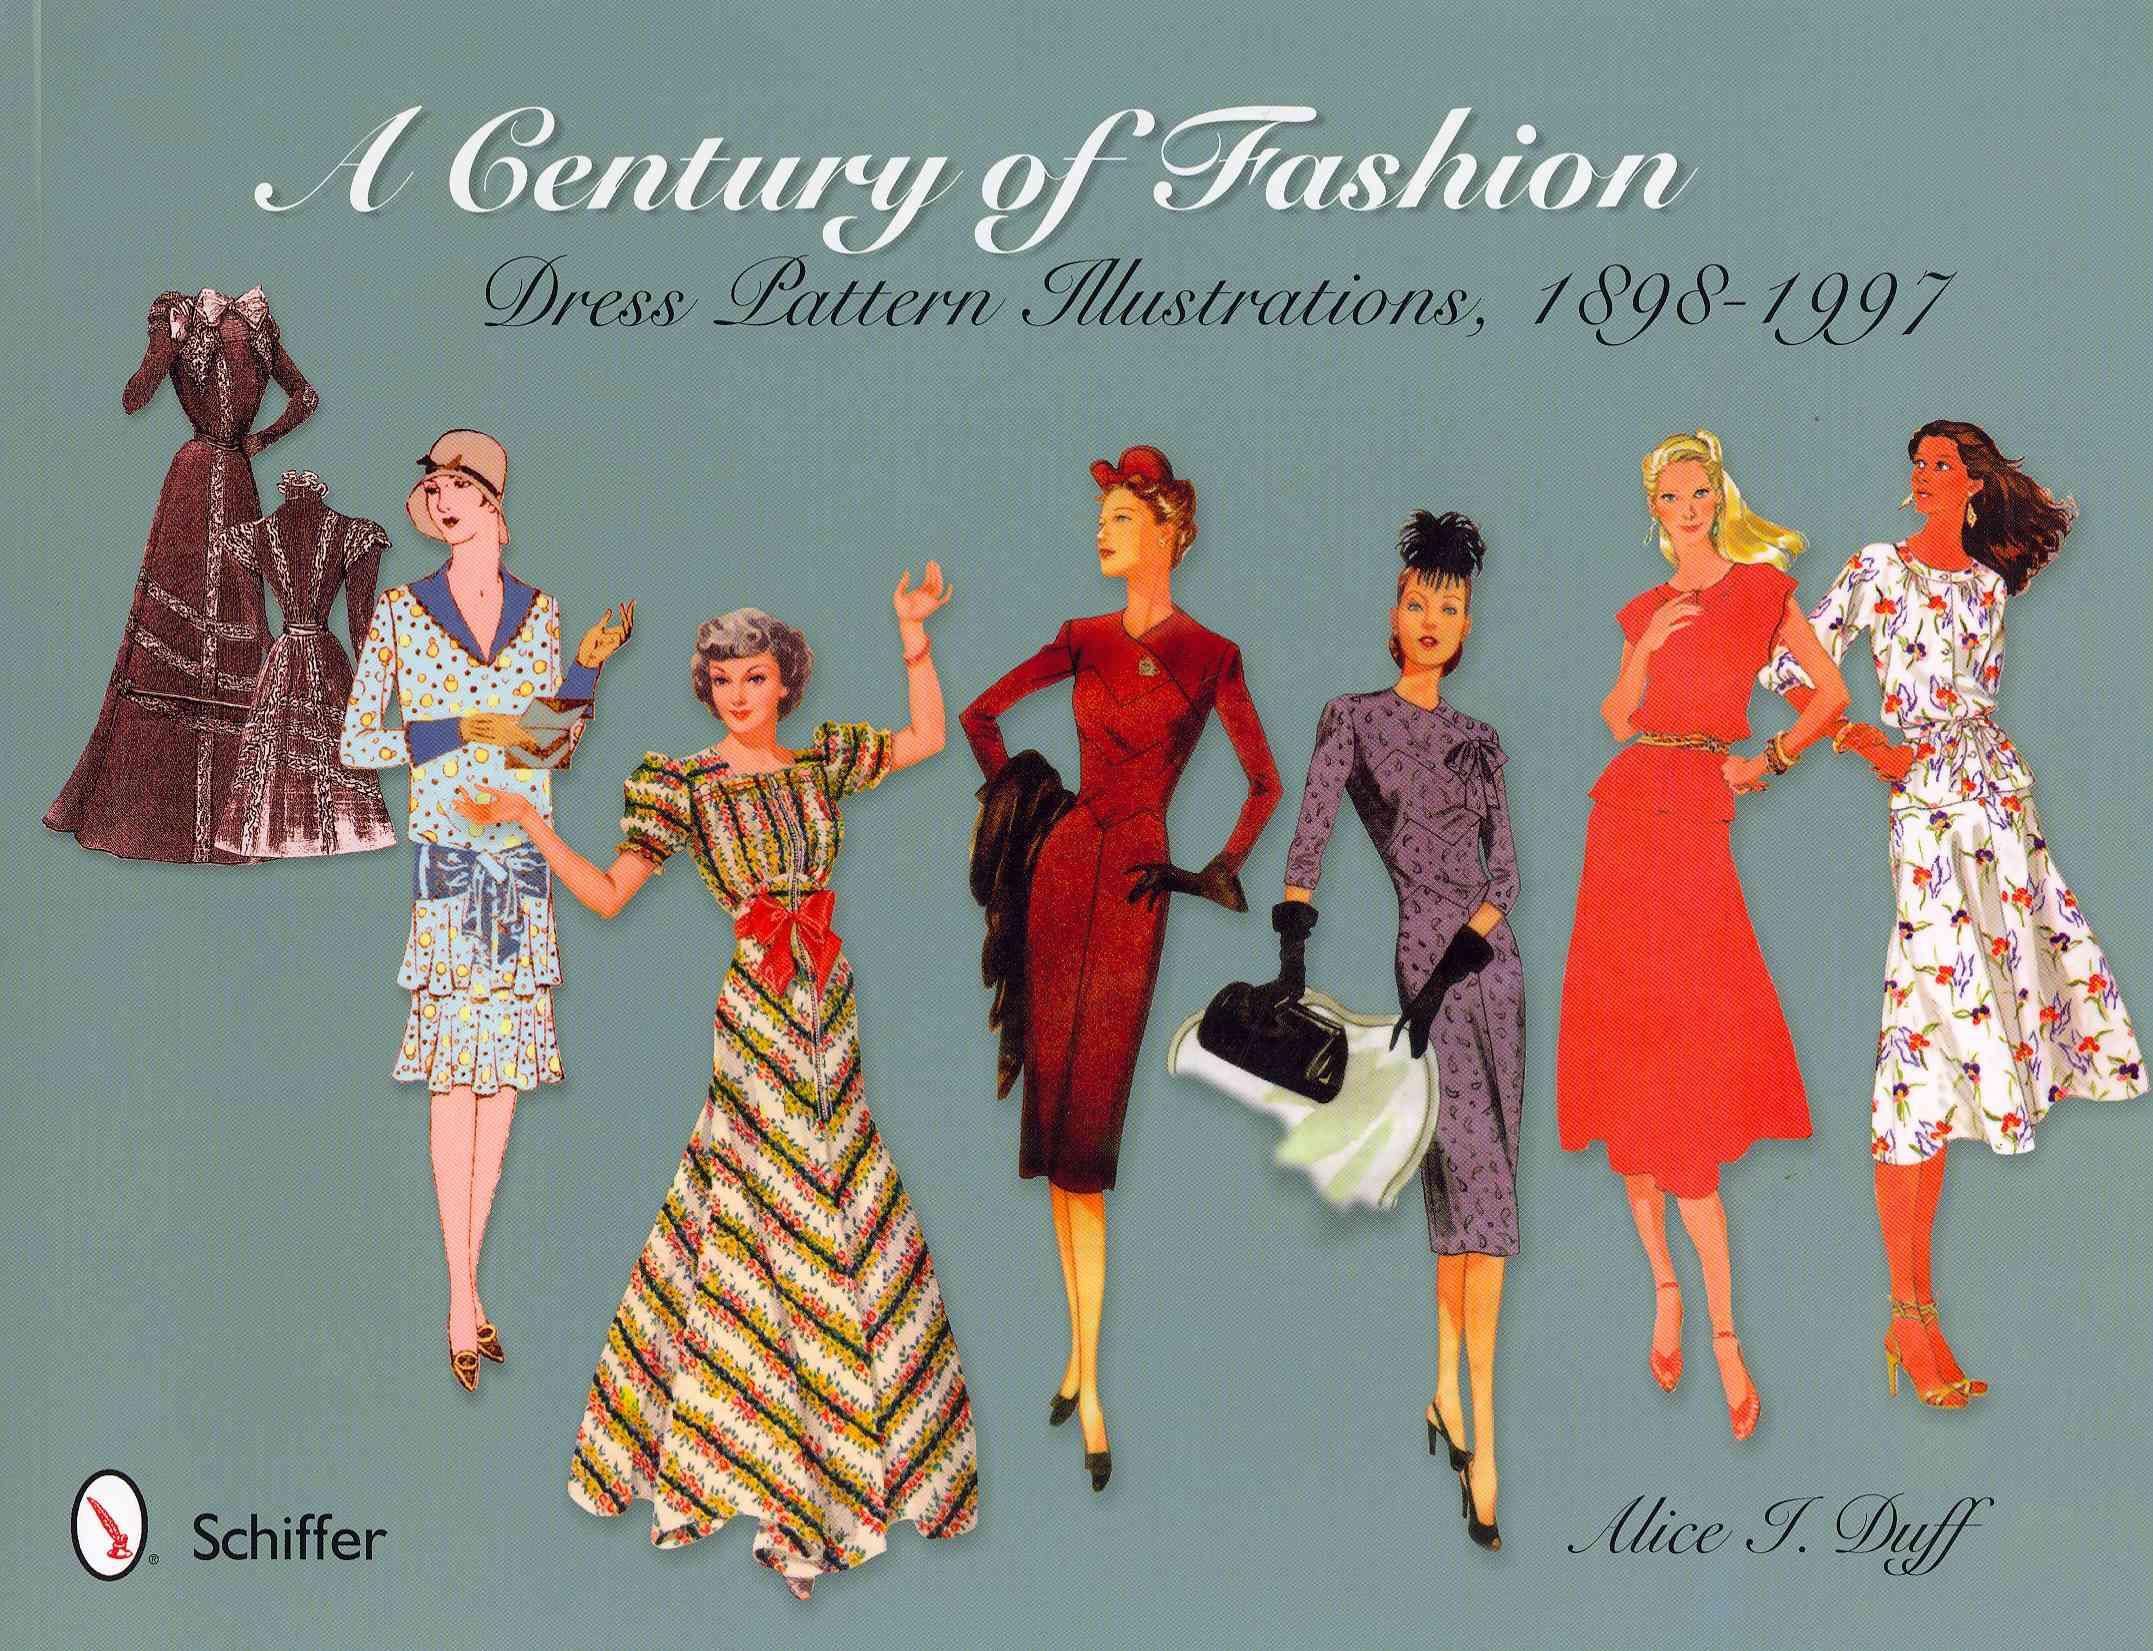 A Century of Fashion: Dress Pattern Illustrations, 1898-1997 (Paperback)